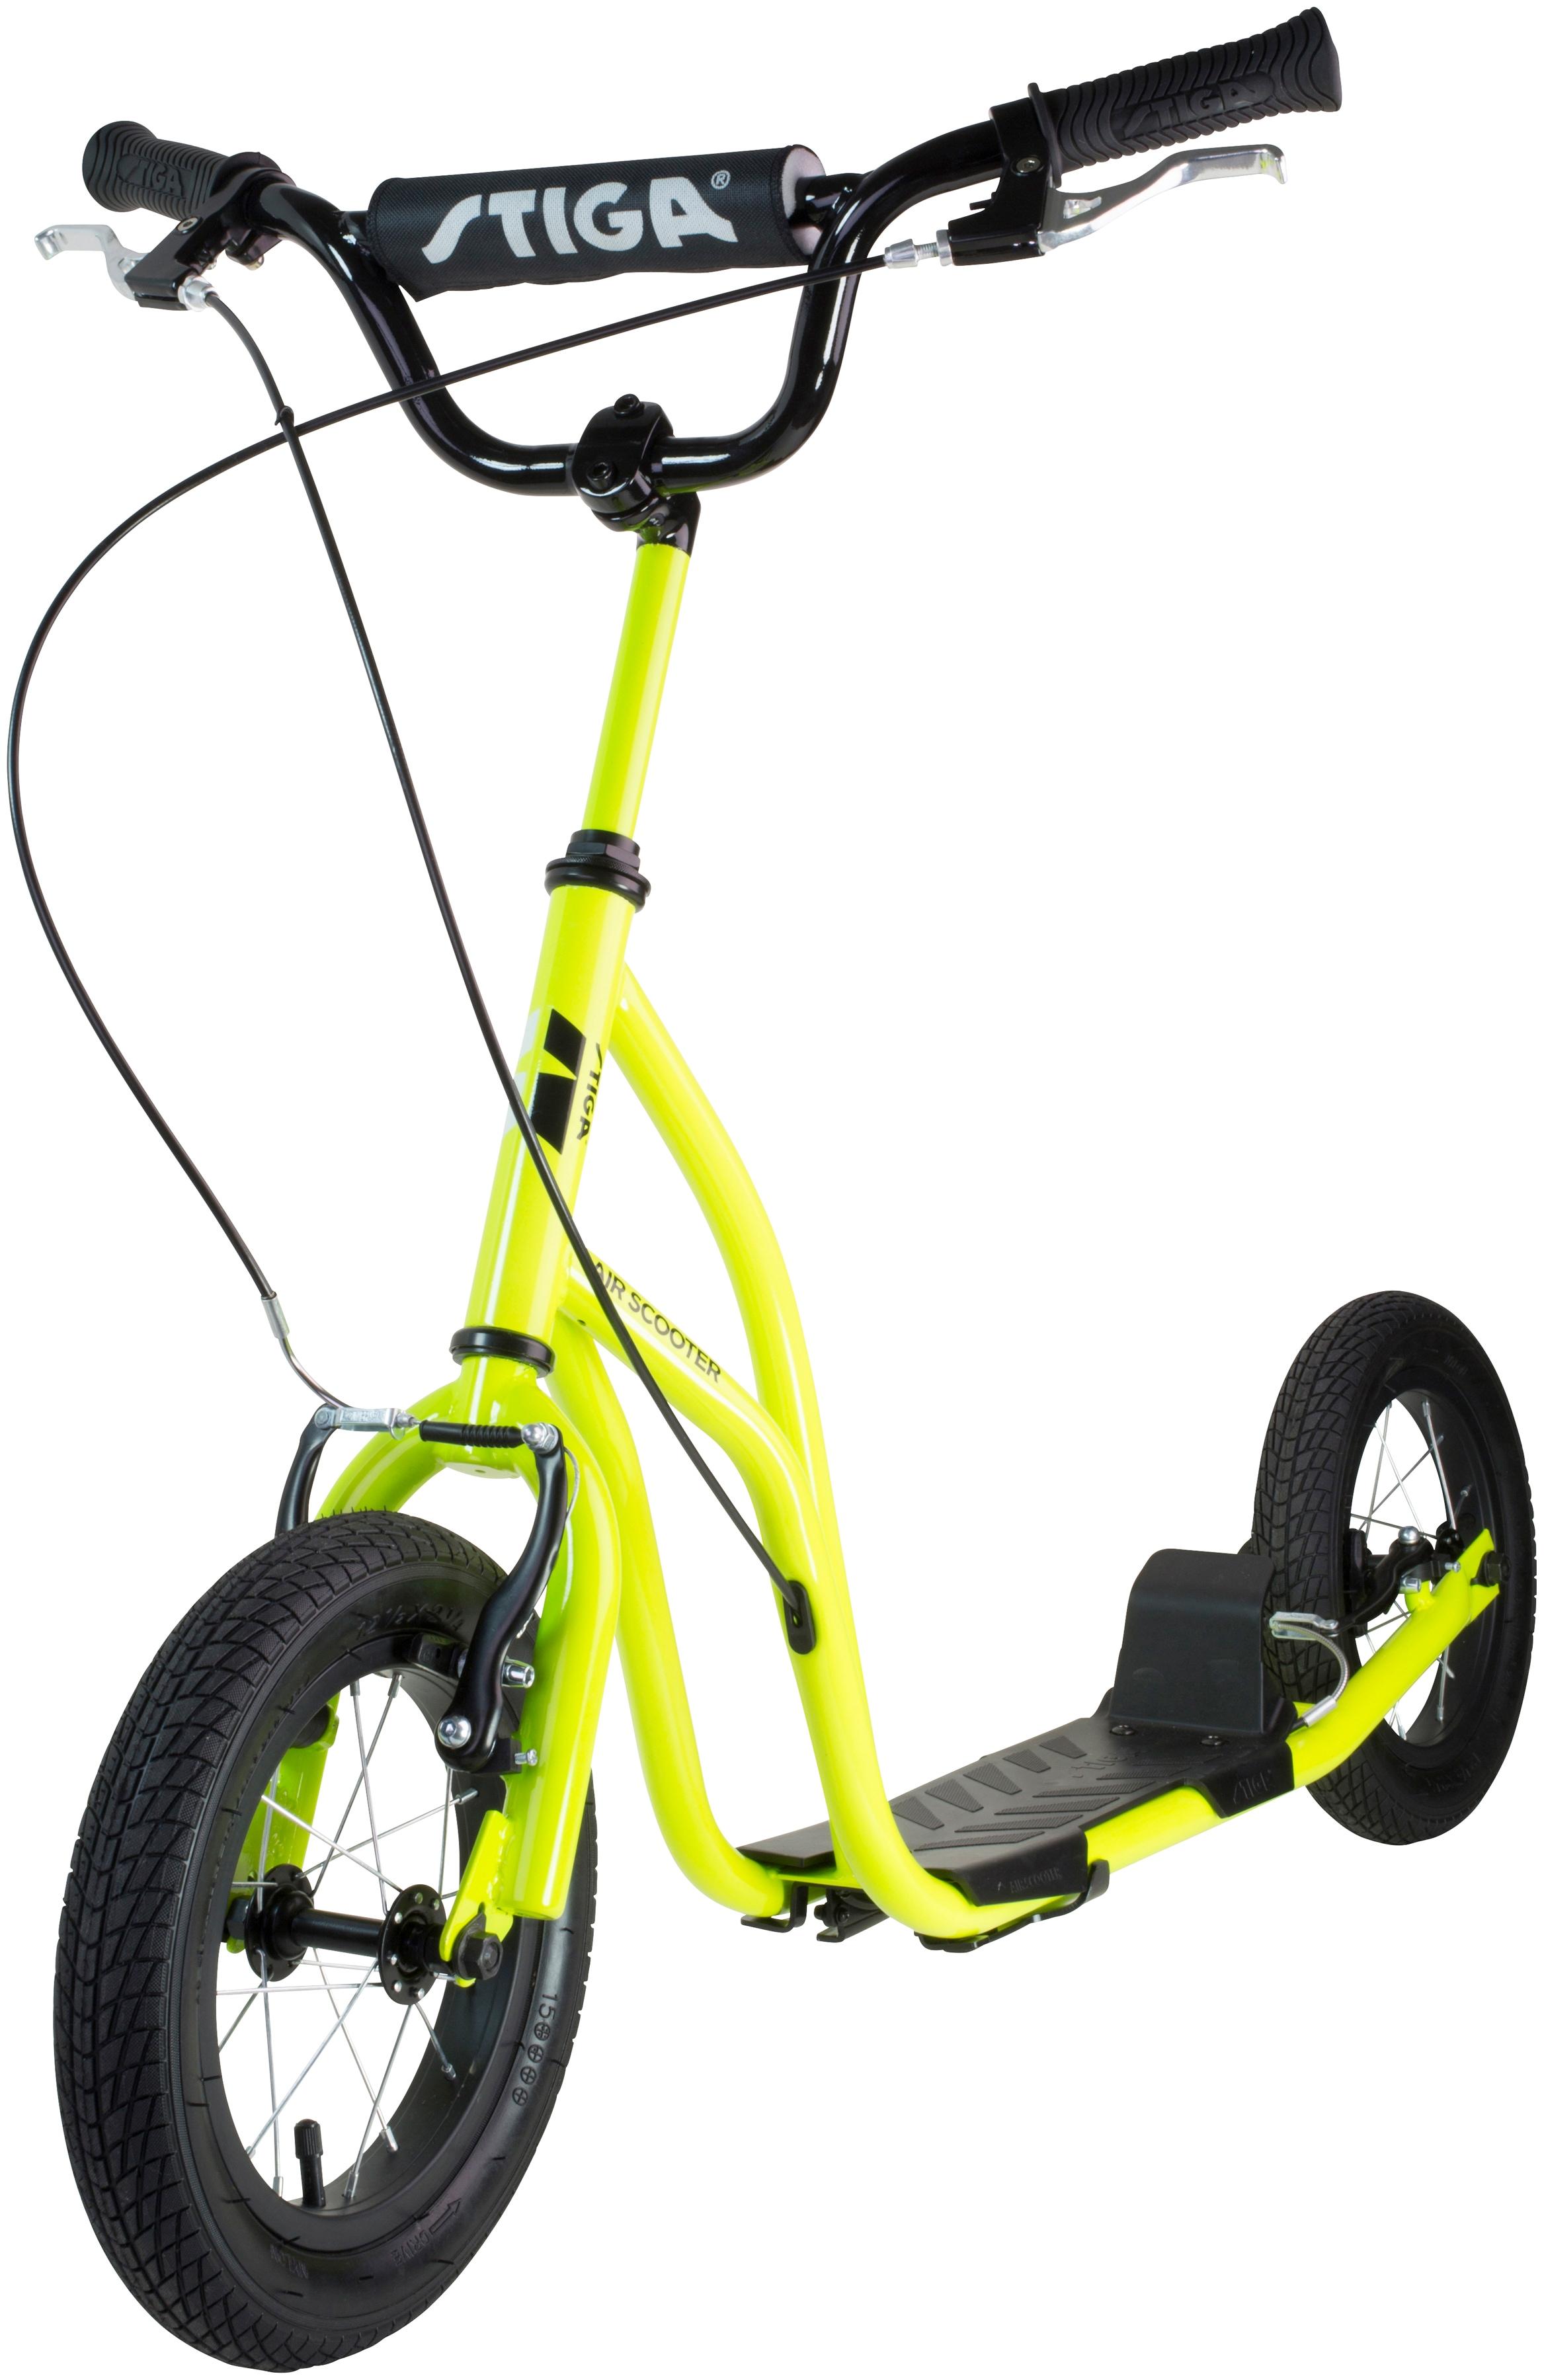 stiga tretroller air scooter f r kinder und erwachsene. Black Bedroom Furniture Sets. Home Design Ideas